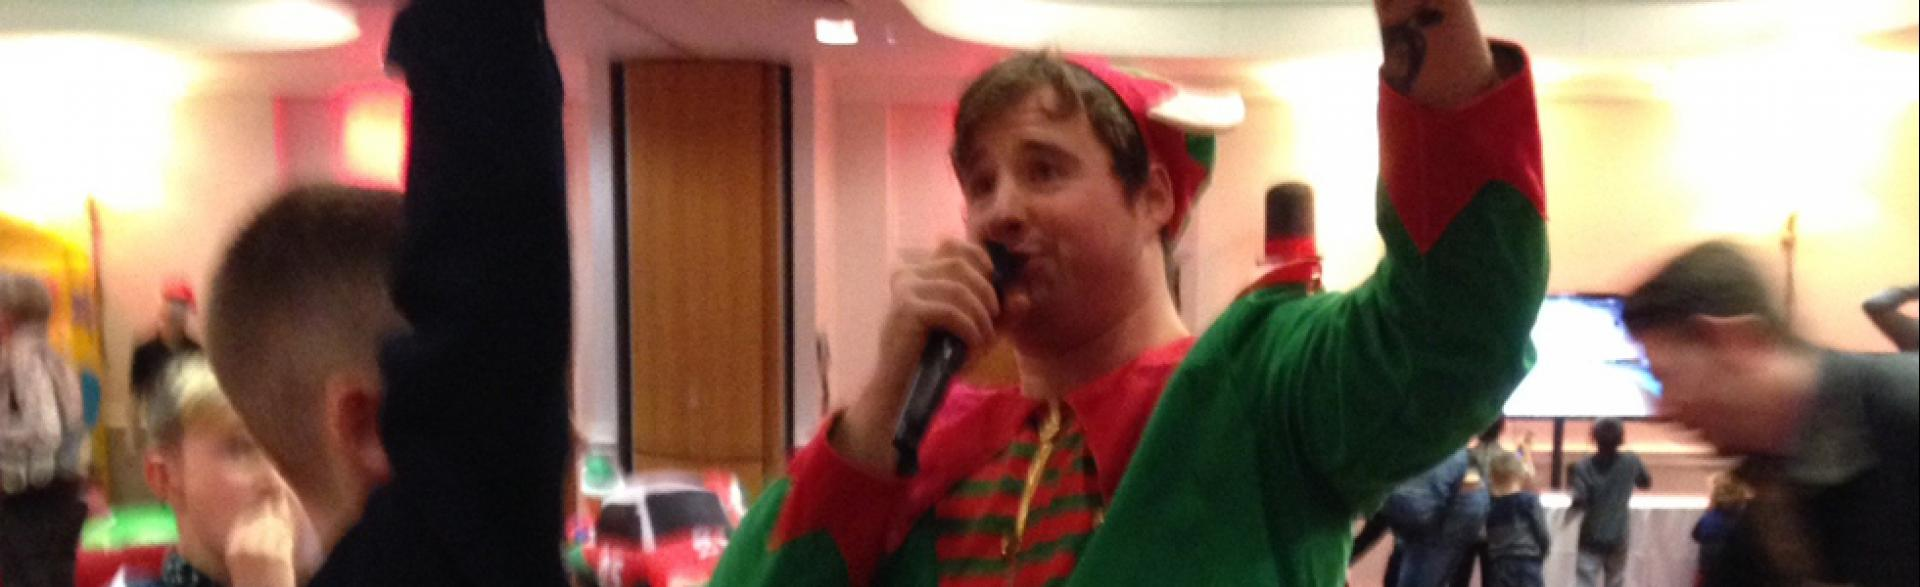 Corporate Fun Day, Middlesborough, December 2014